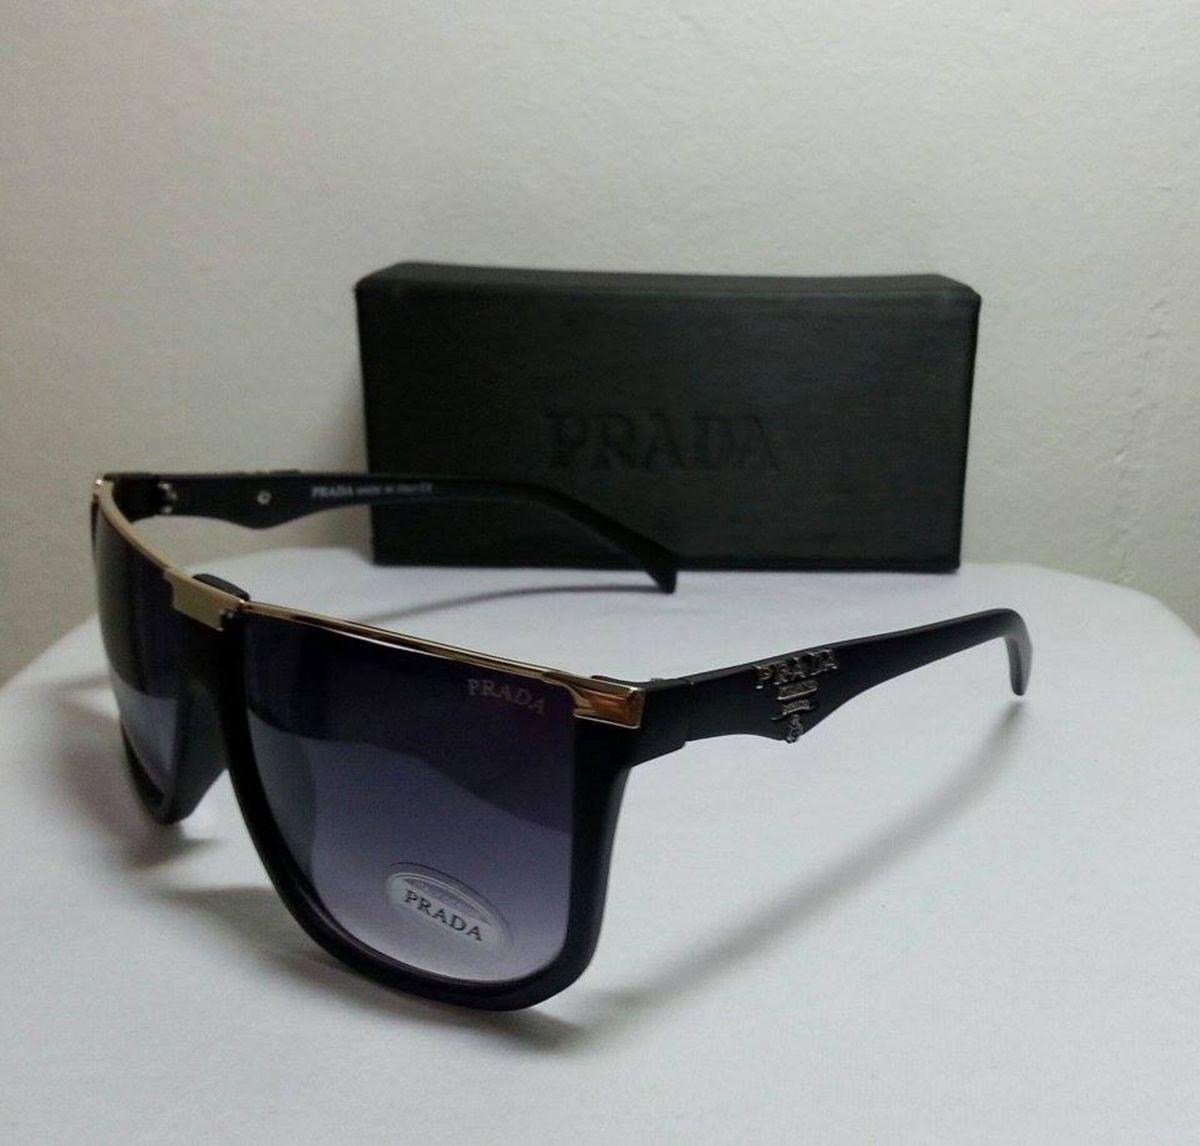 12bde2df4cb6e óculos de sol prada milano luxuria - óculos prada